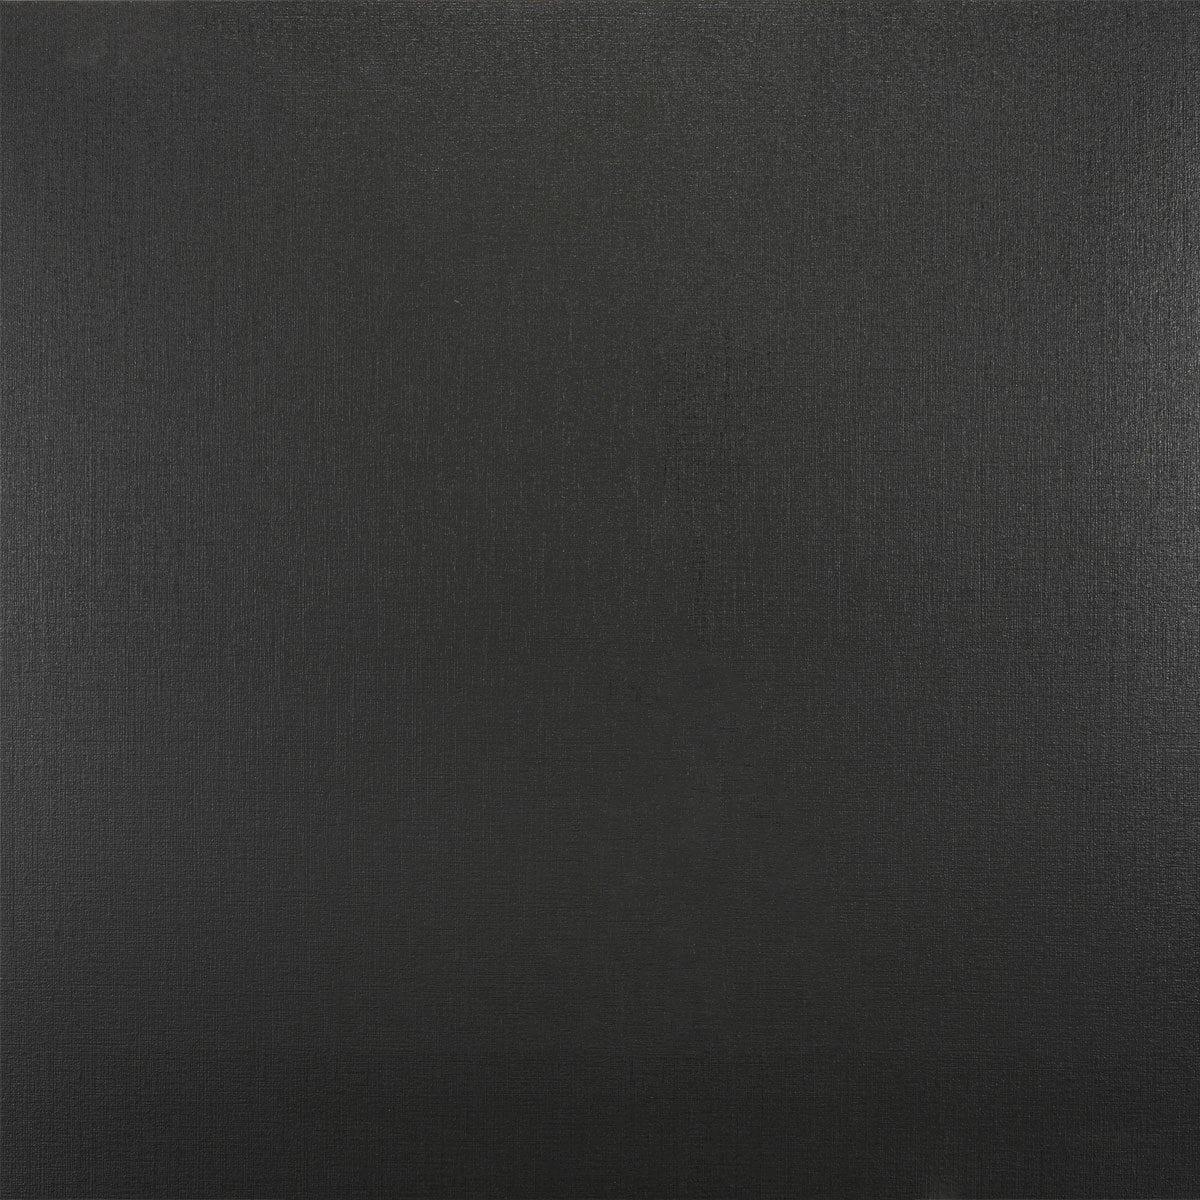 COSMOPOLITAN BLACK T10494 P1